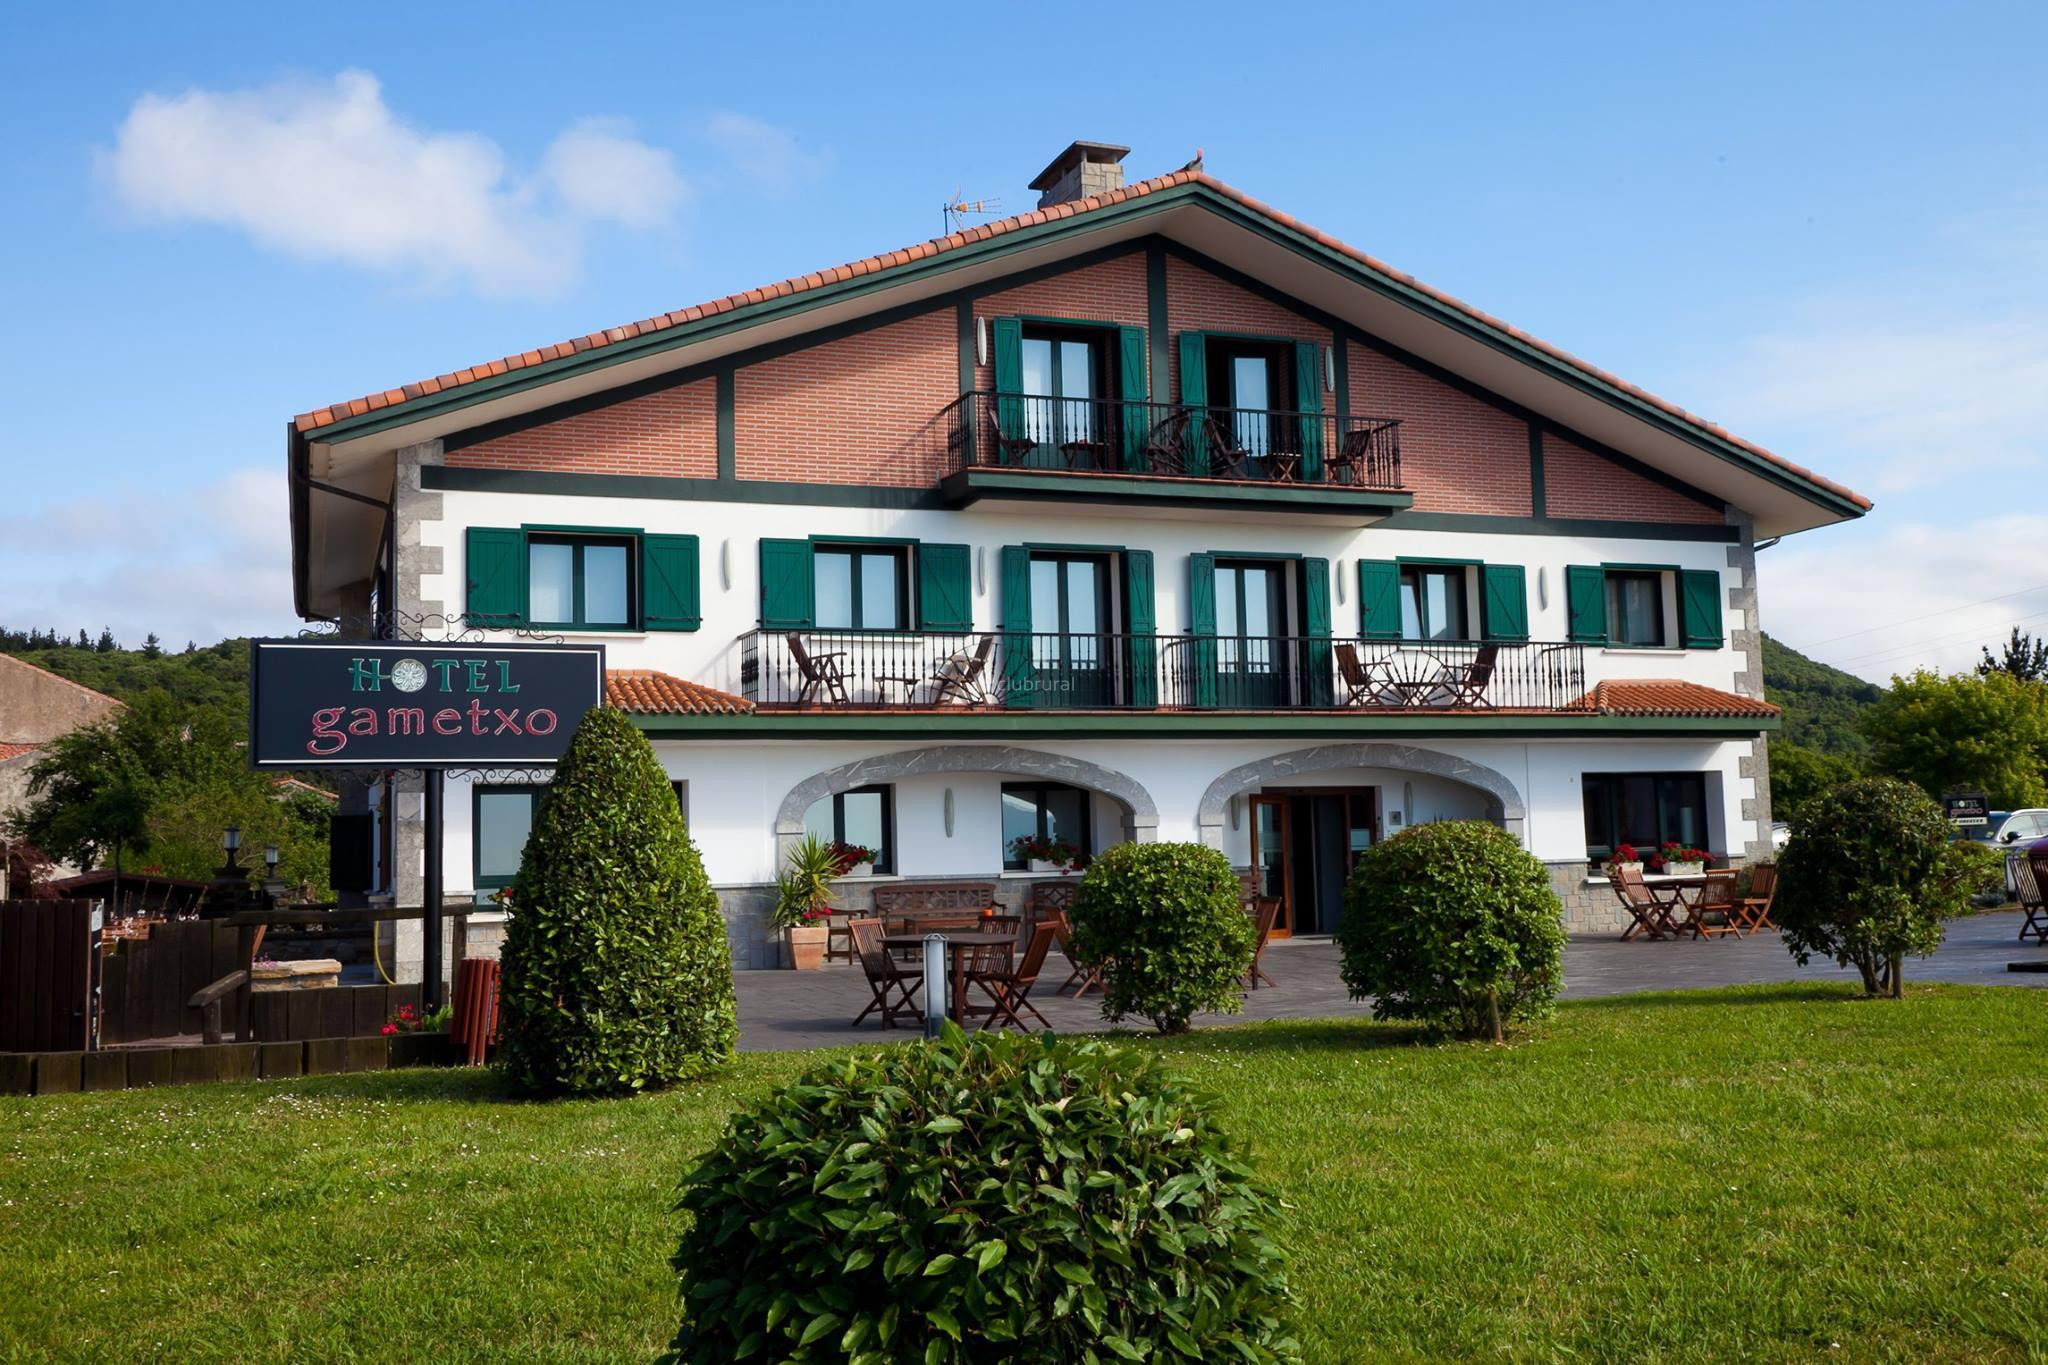 Fotos de hotel gametxo vizcaya ibarrangelu clubrural - Lurdeia casa rural bermeo ...